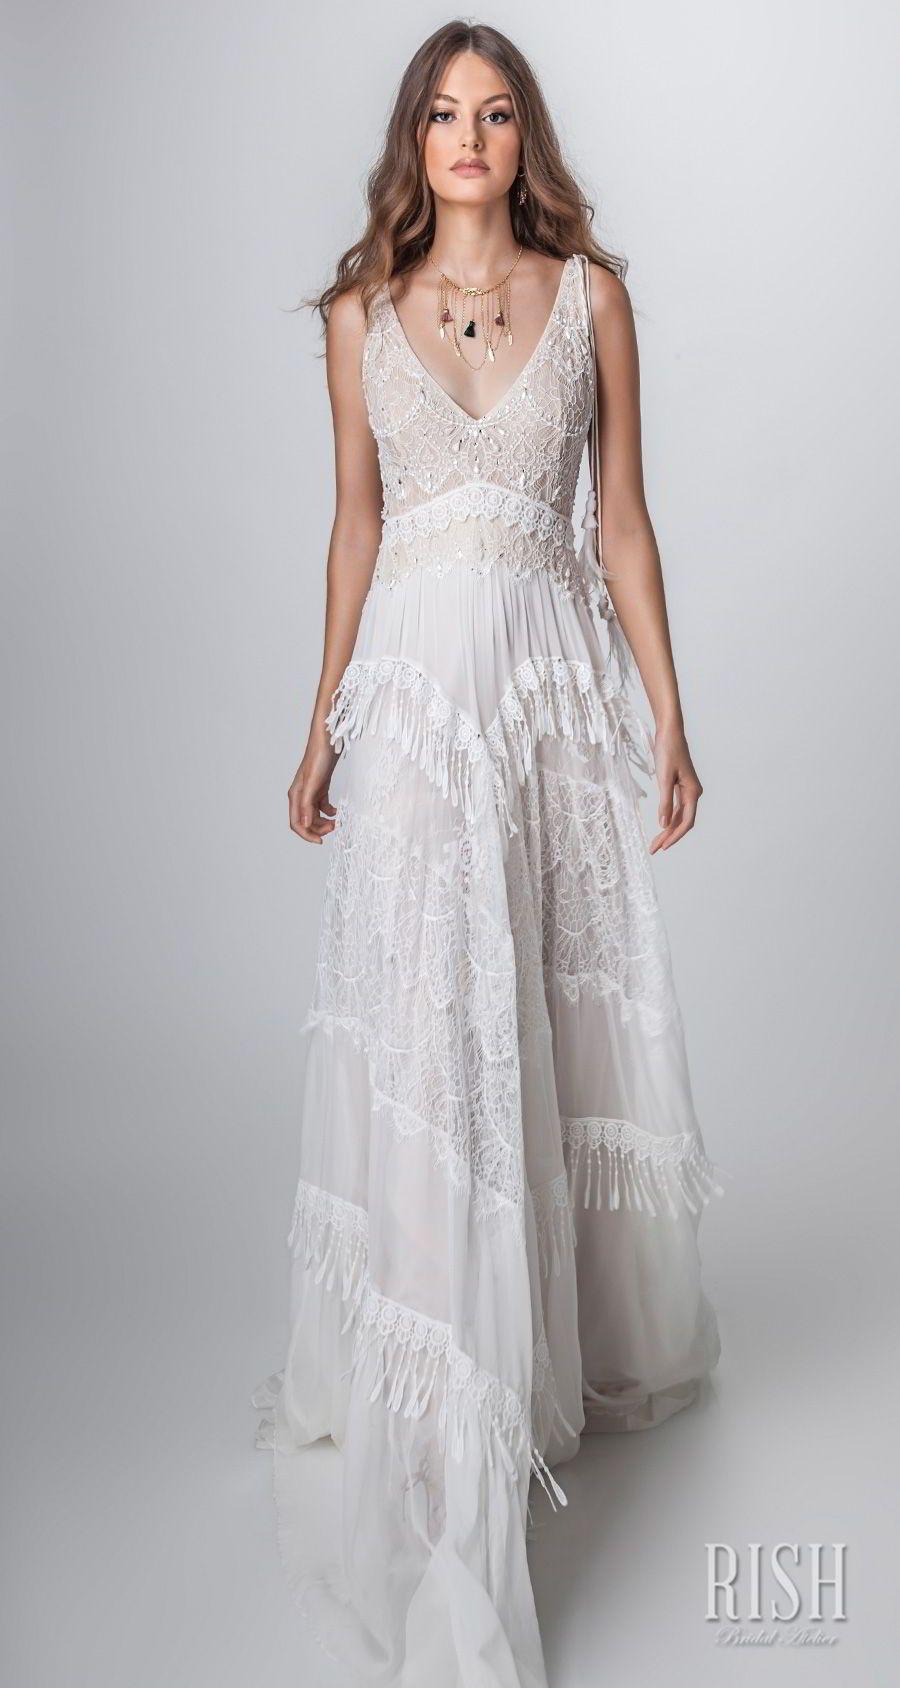 Rish Bridal ucSun Danceud Collection u Boho Chic Wedding Dresses